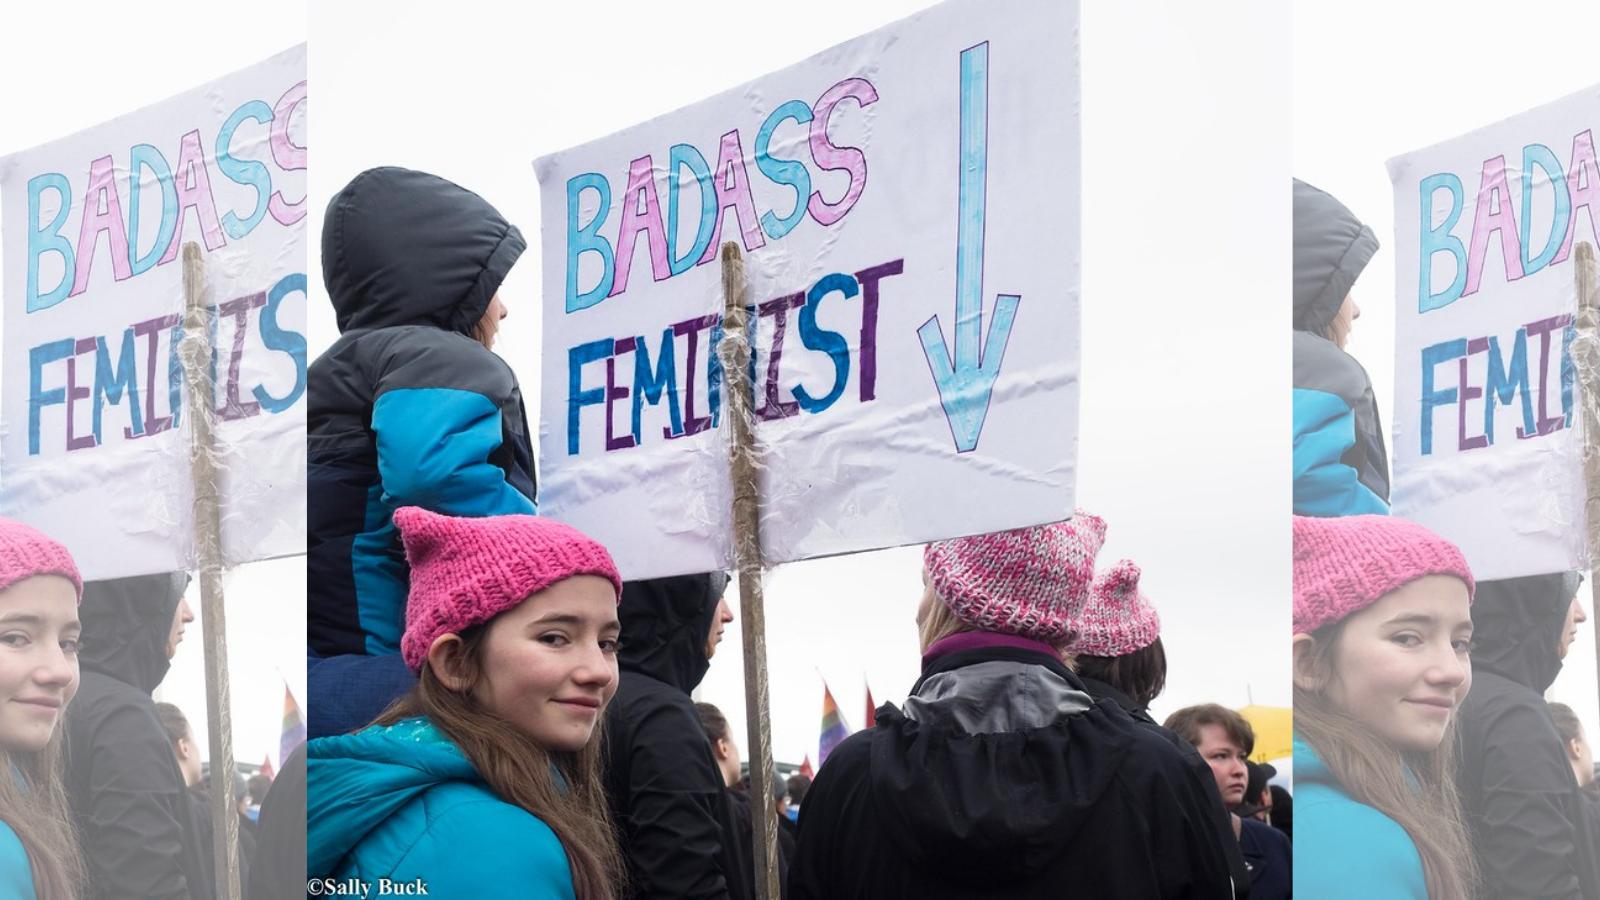 msmagazine.com: Weekend Reading on Women's Representation: The Patriarchy Does Not Spark Joy